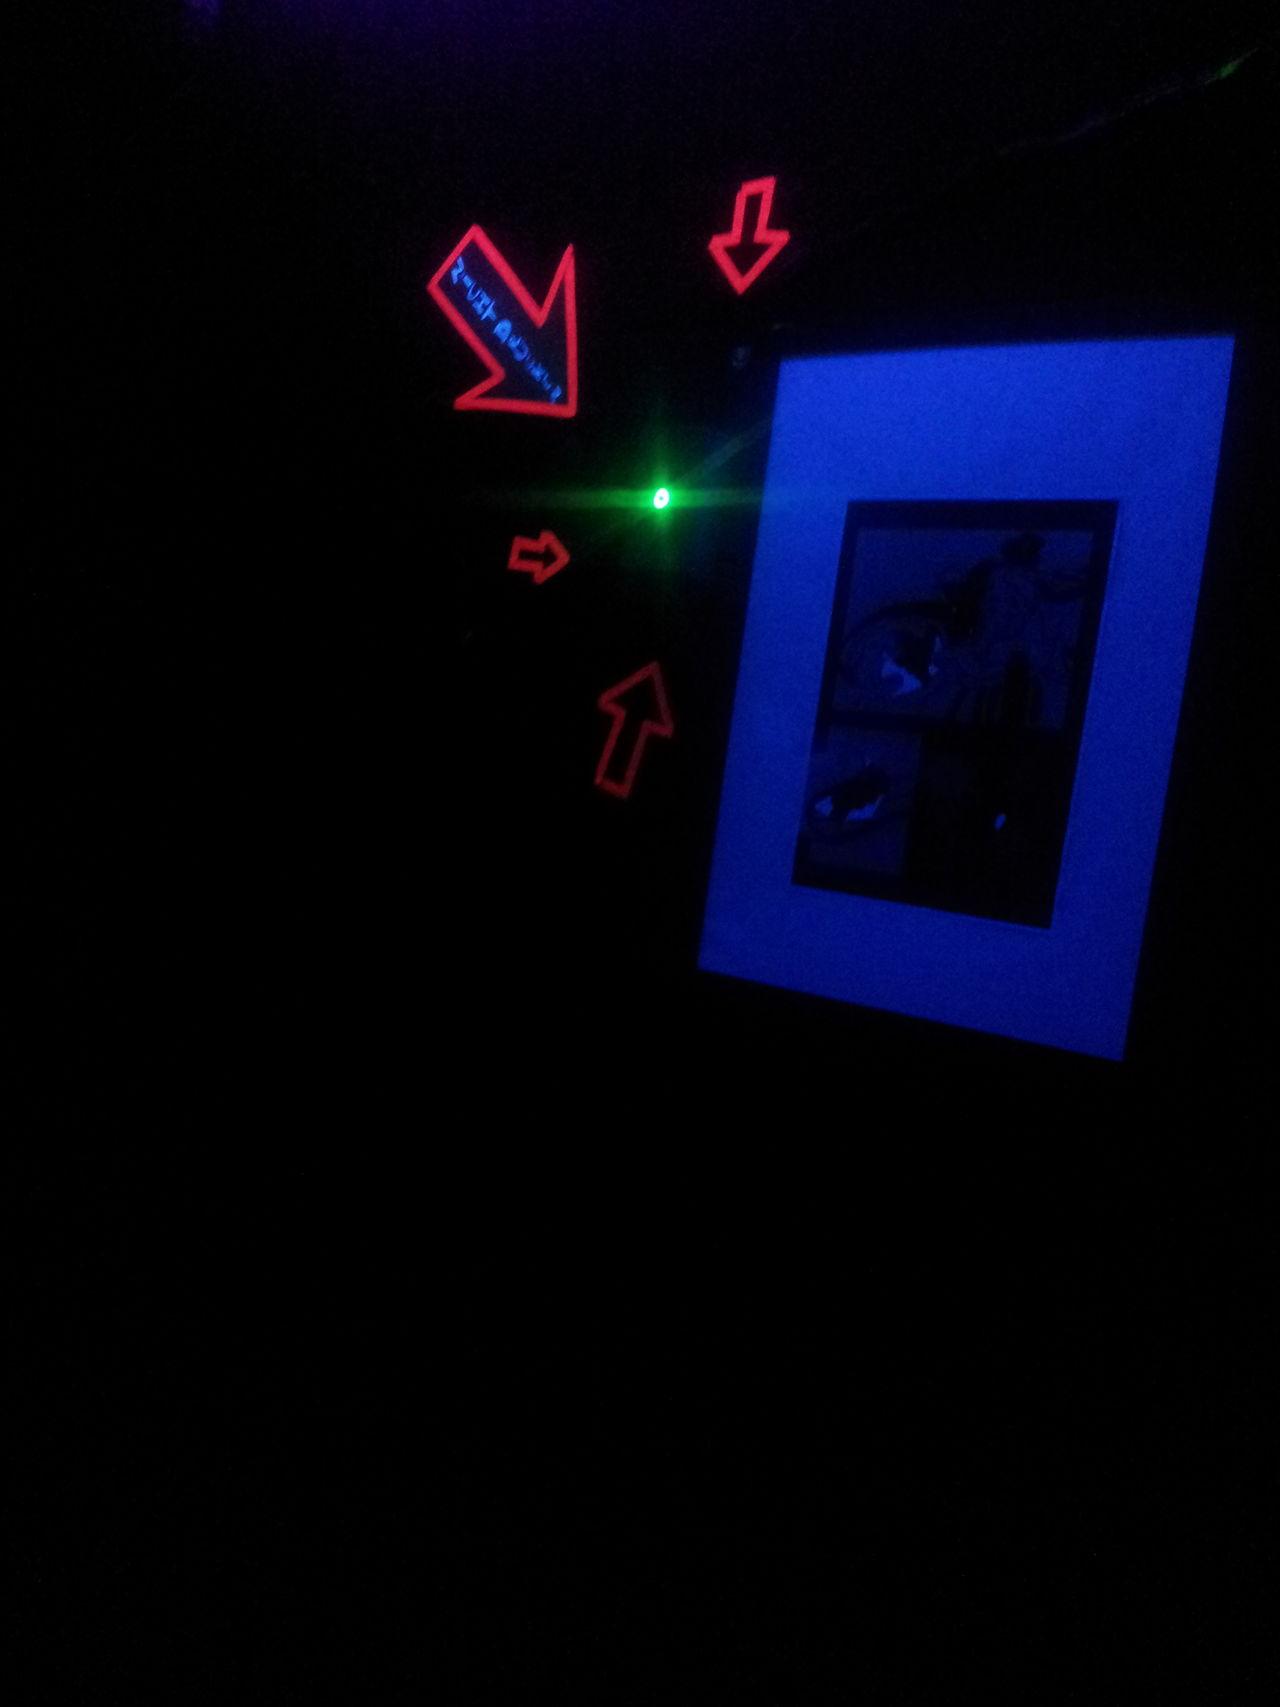 Illuminated Neon No People Indoors  Exit Sign Luminosity Night Dark Architecture Hello World One Man Only Human Body Part